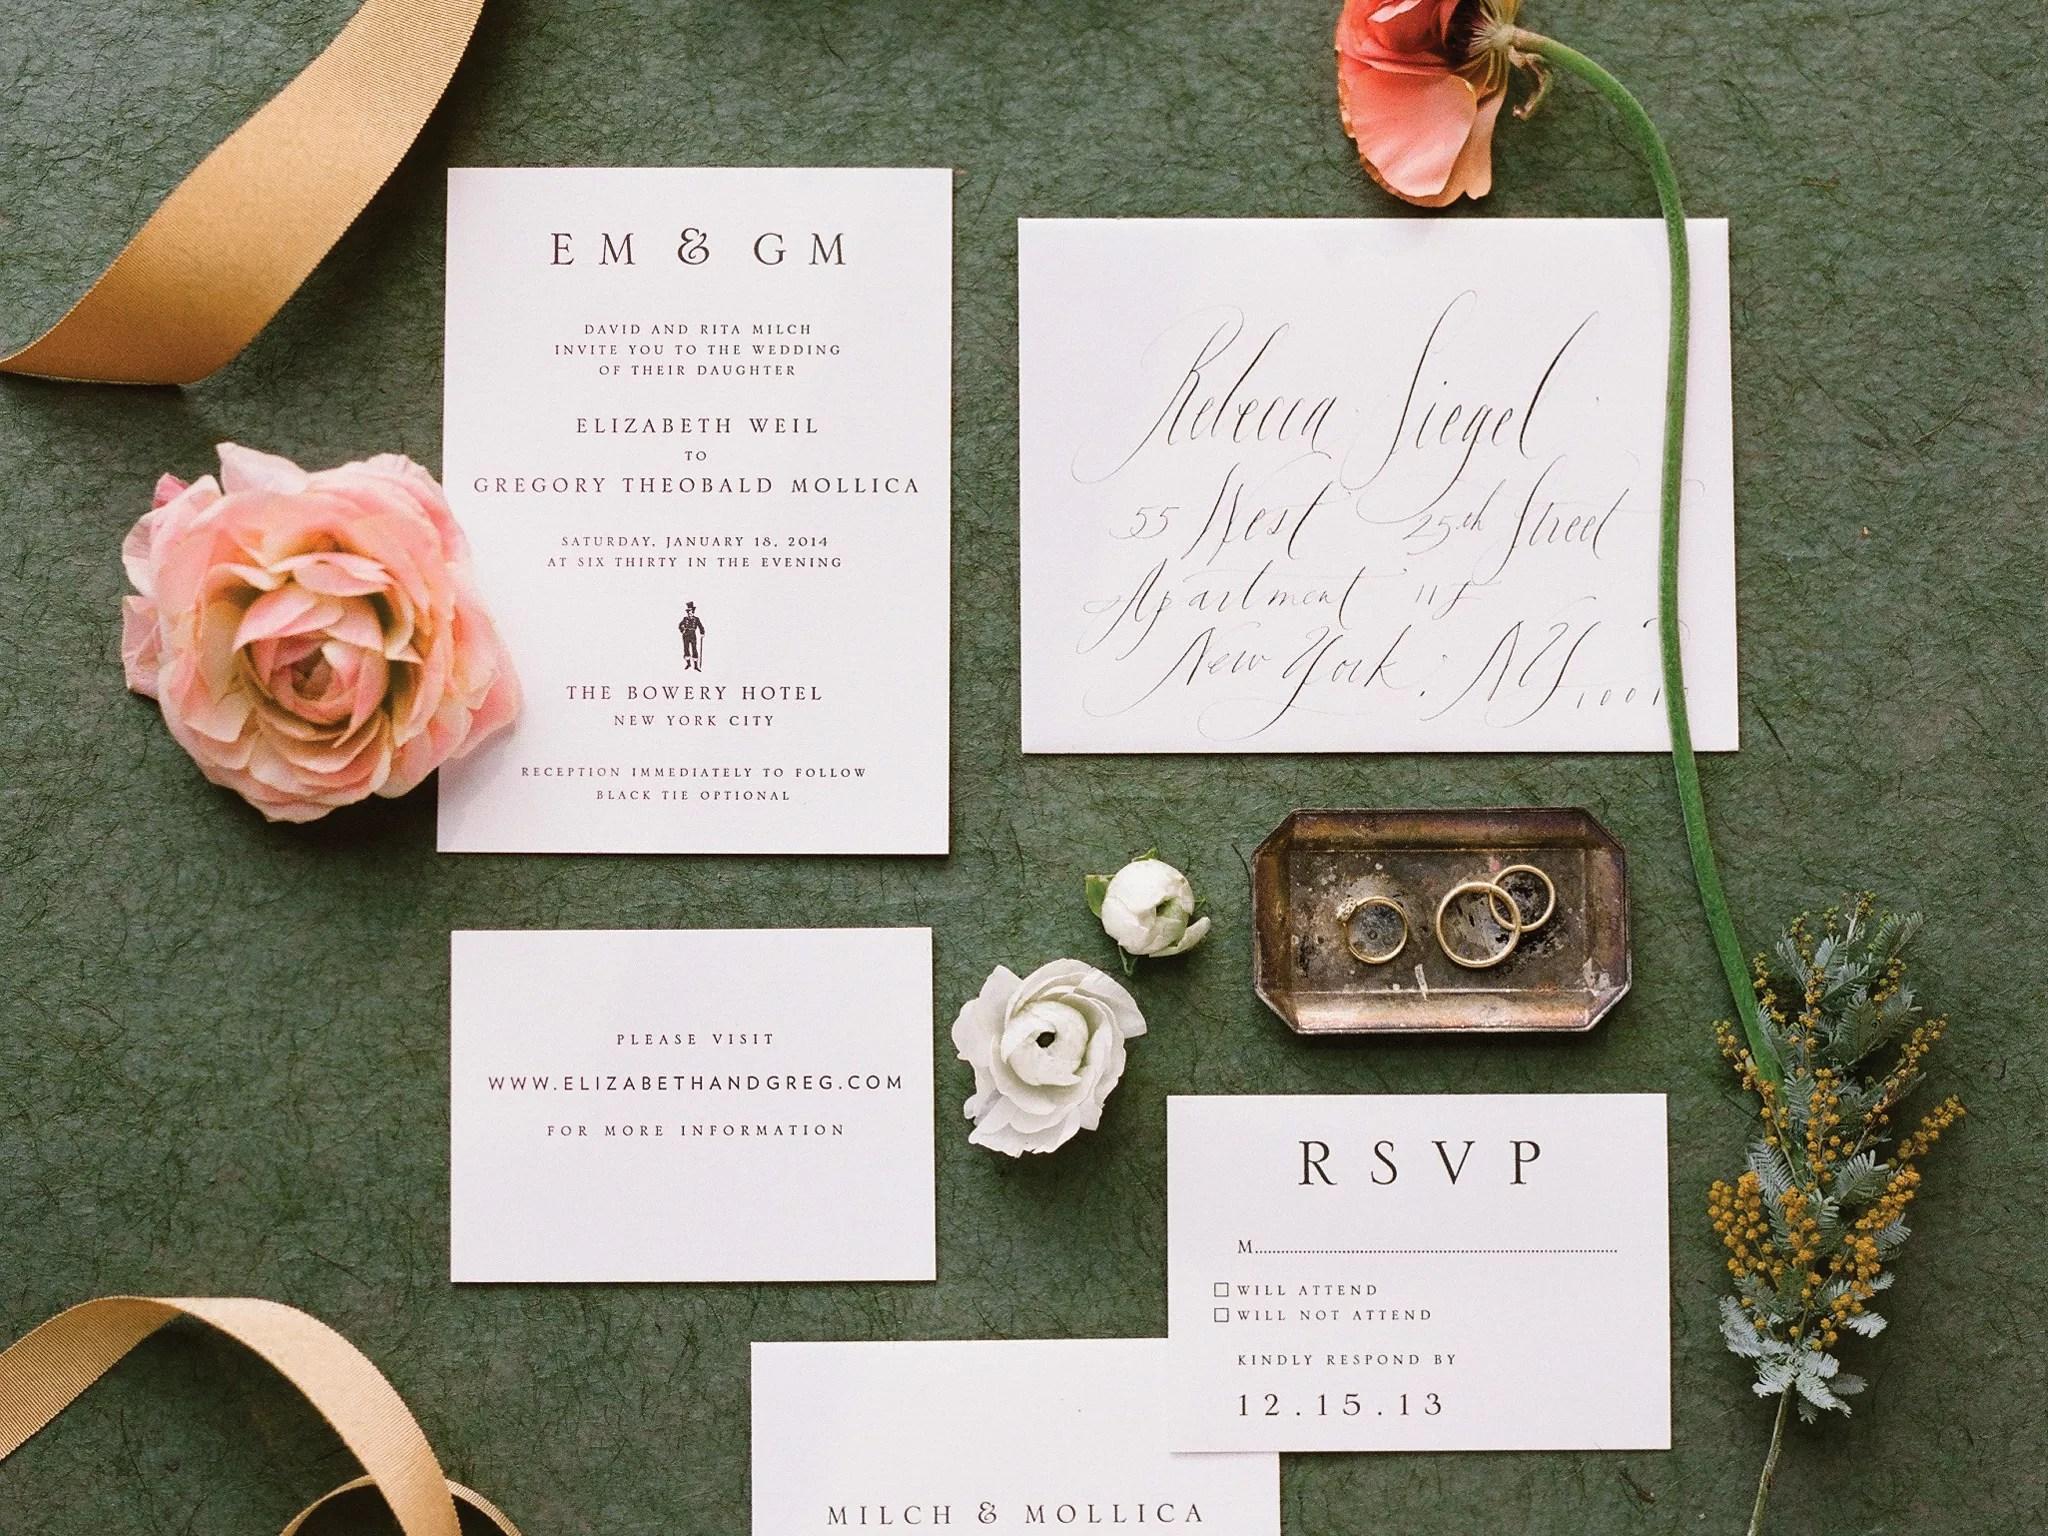 wedding invitations etiquette wedding invitation envelopes